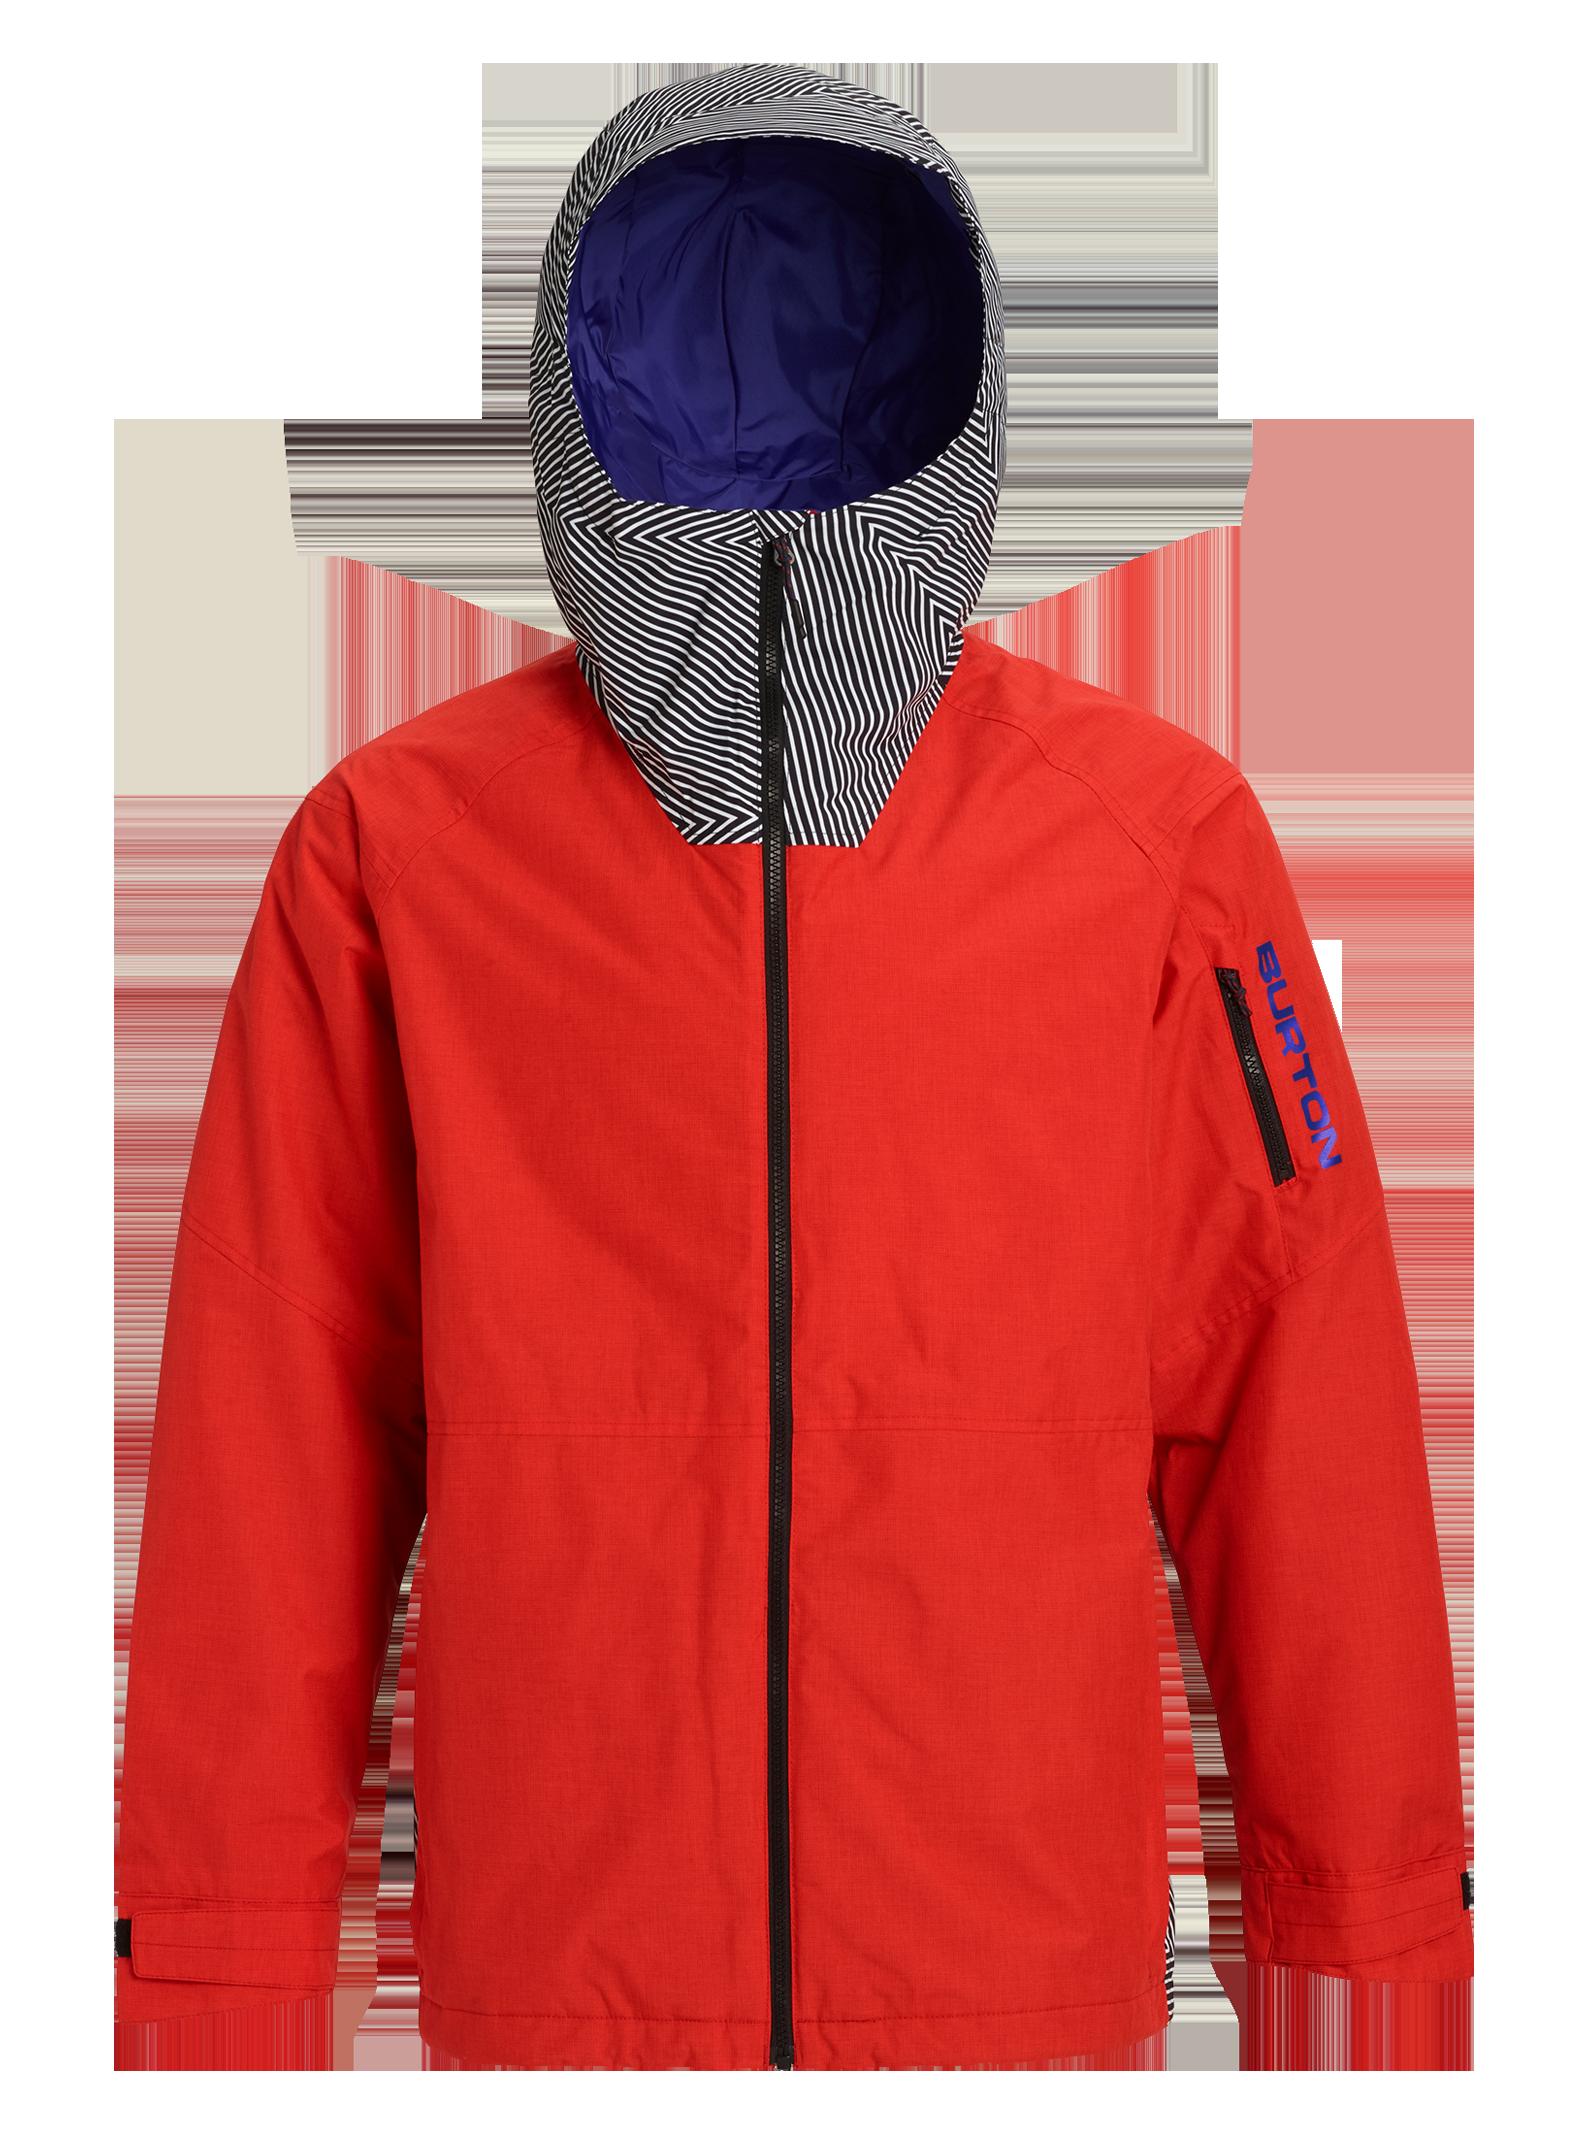 Details about  /Burton Men/'s Ski//Snowboard Hilltop Jacket FMSCAR//SPUNOT Size XXS NEW With Tags